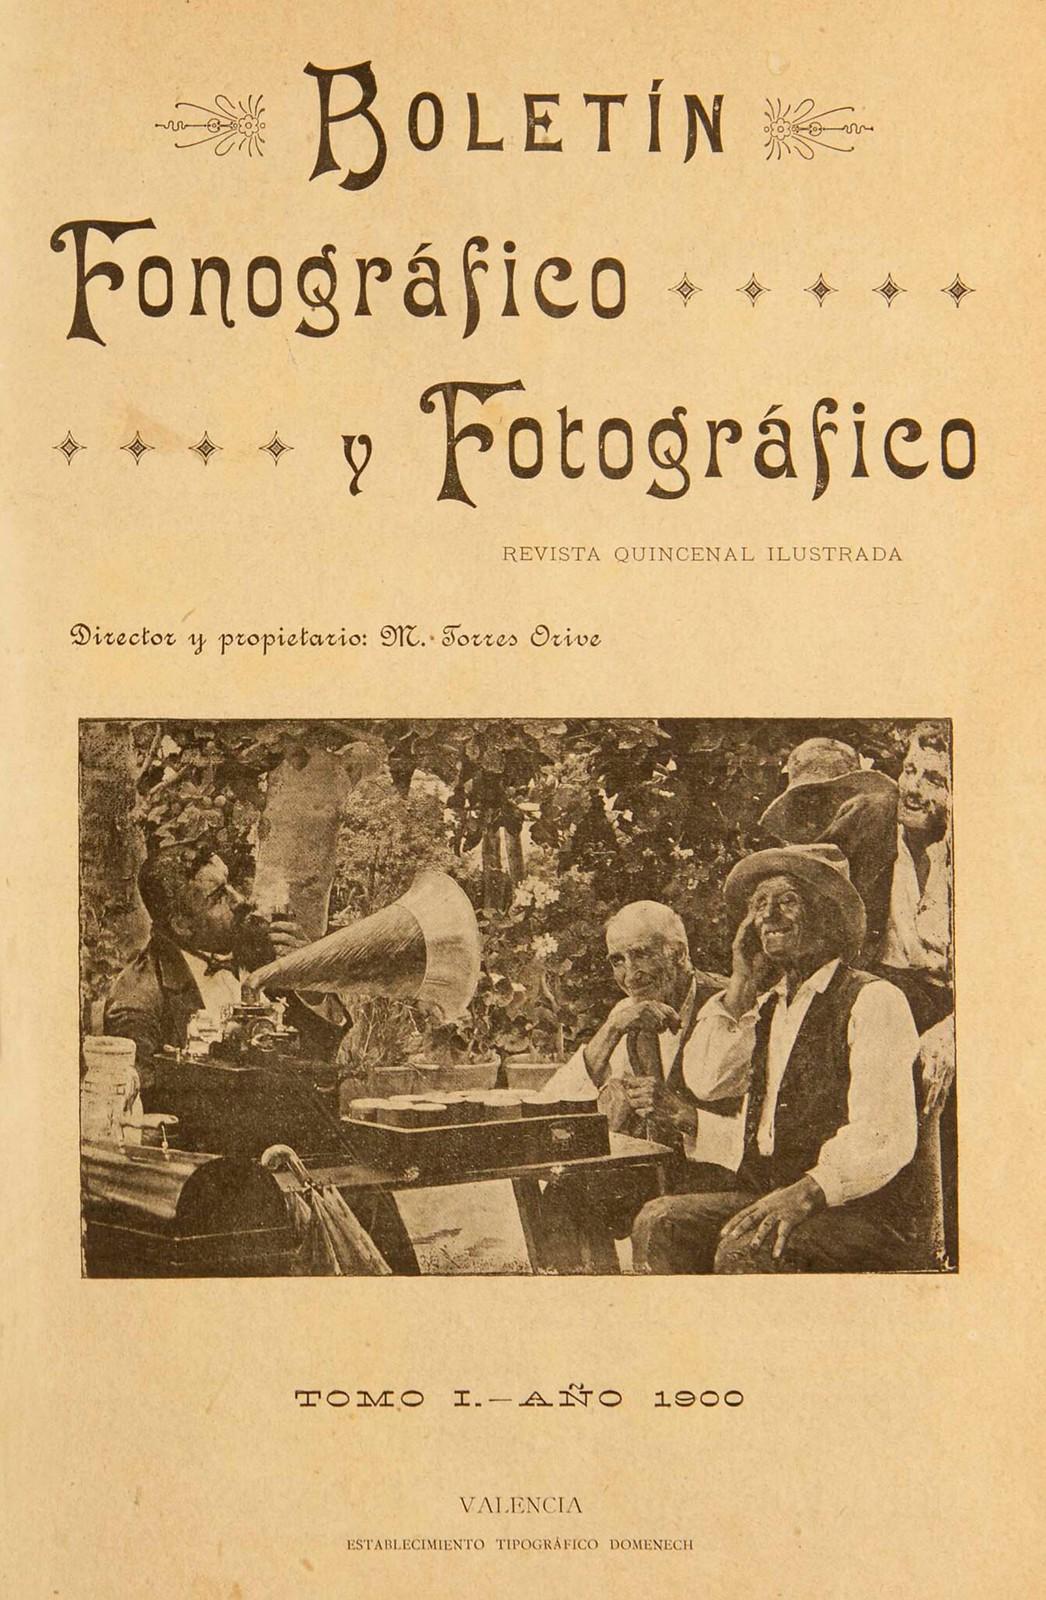 fonografico